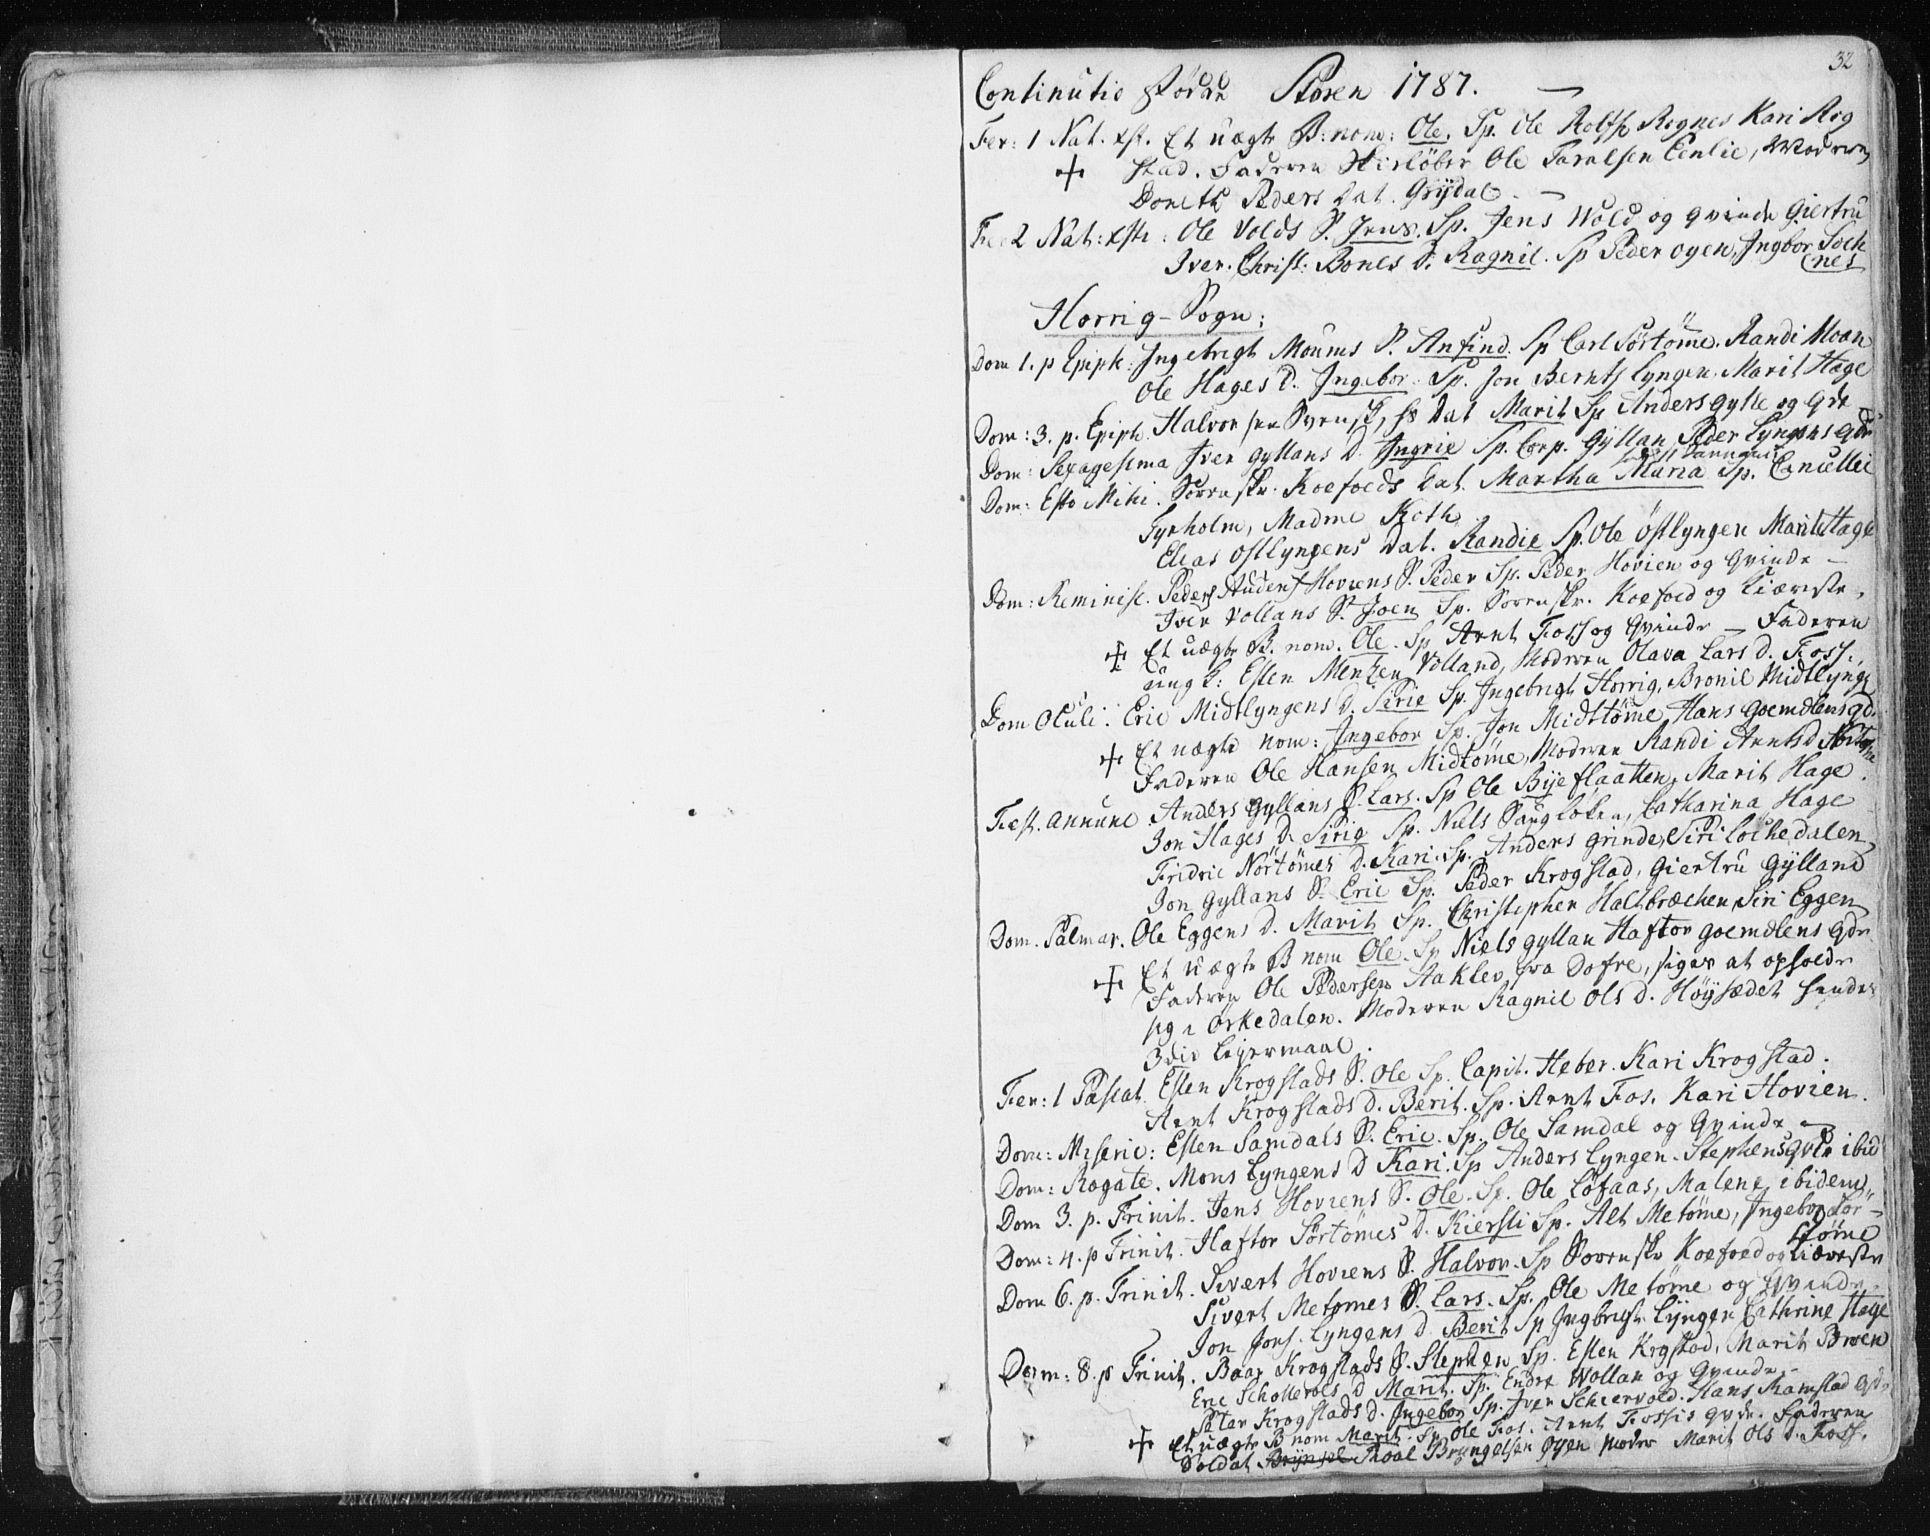 SAT, Ministerialprotokoller, klokkerbøker og fødselsregistre - Sør-Trøndelag, 687/L0991: Parish register (official) no. 687A02, 1747-1790, p. 32